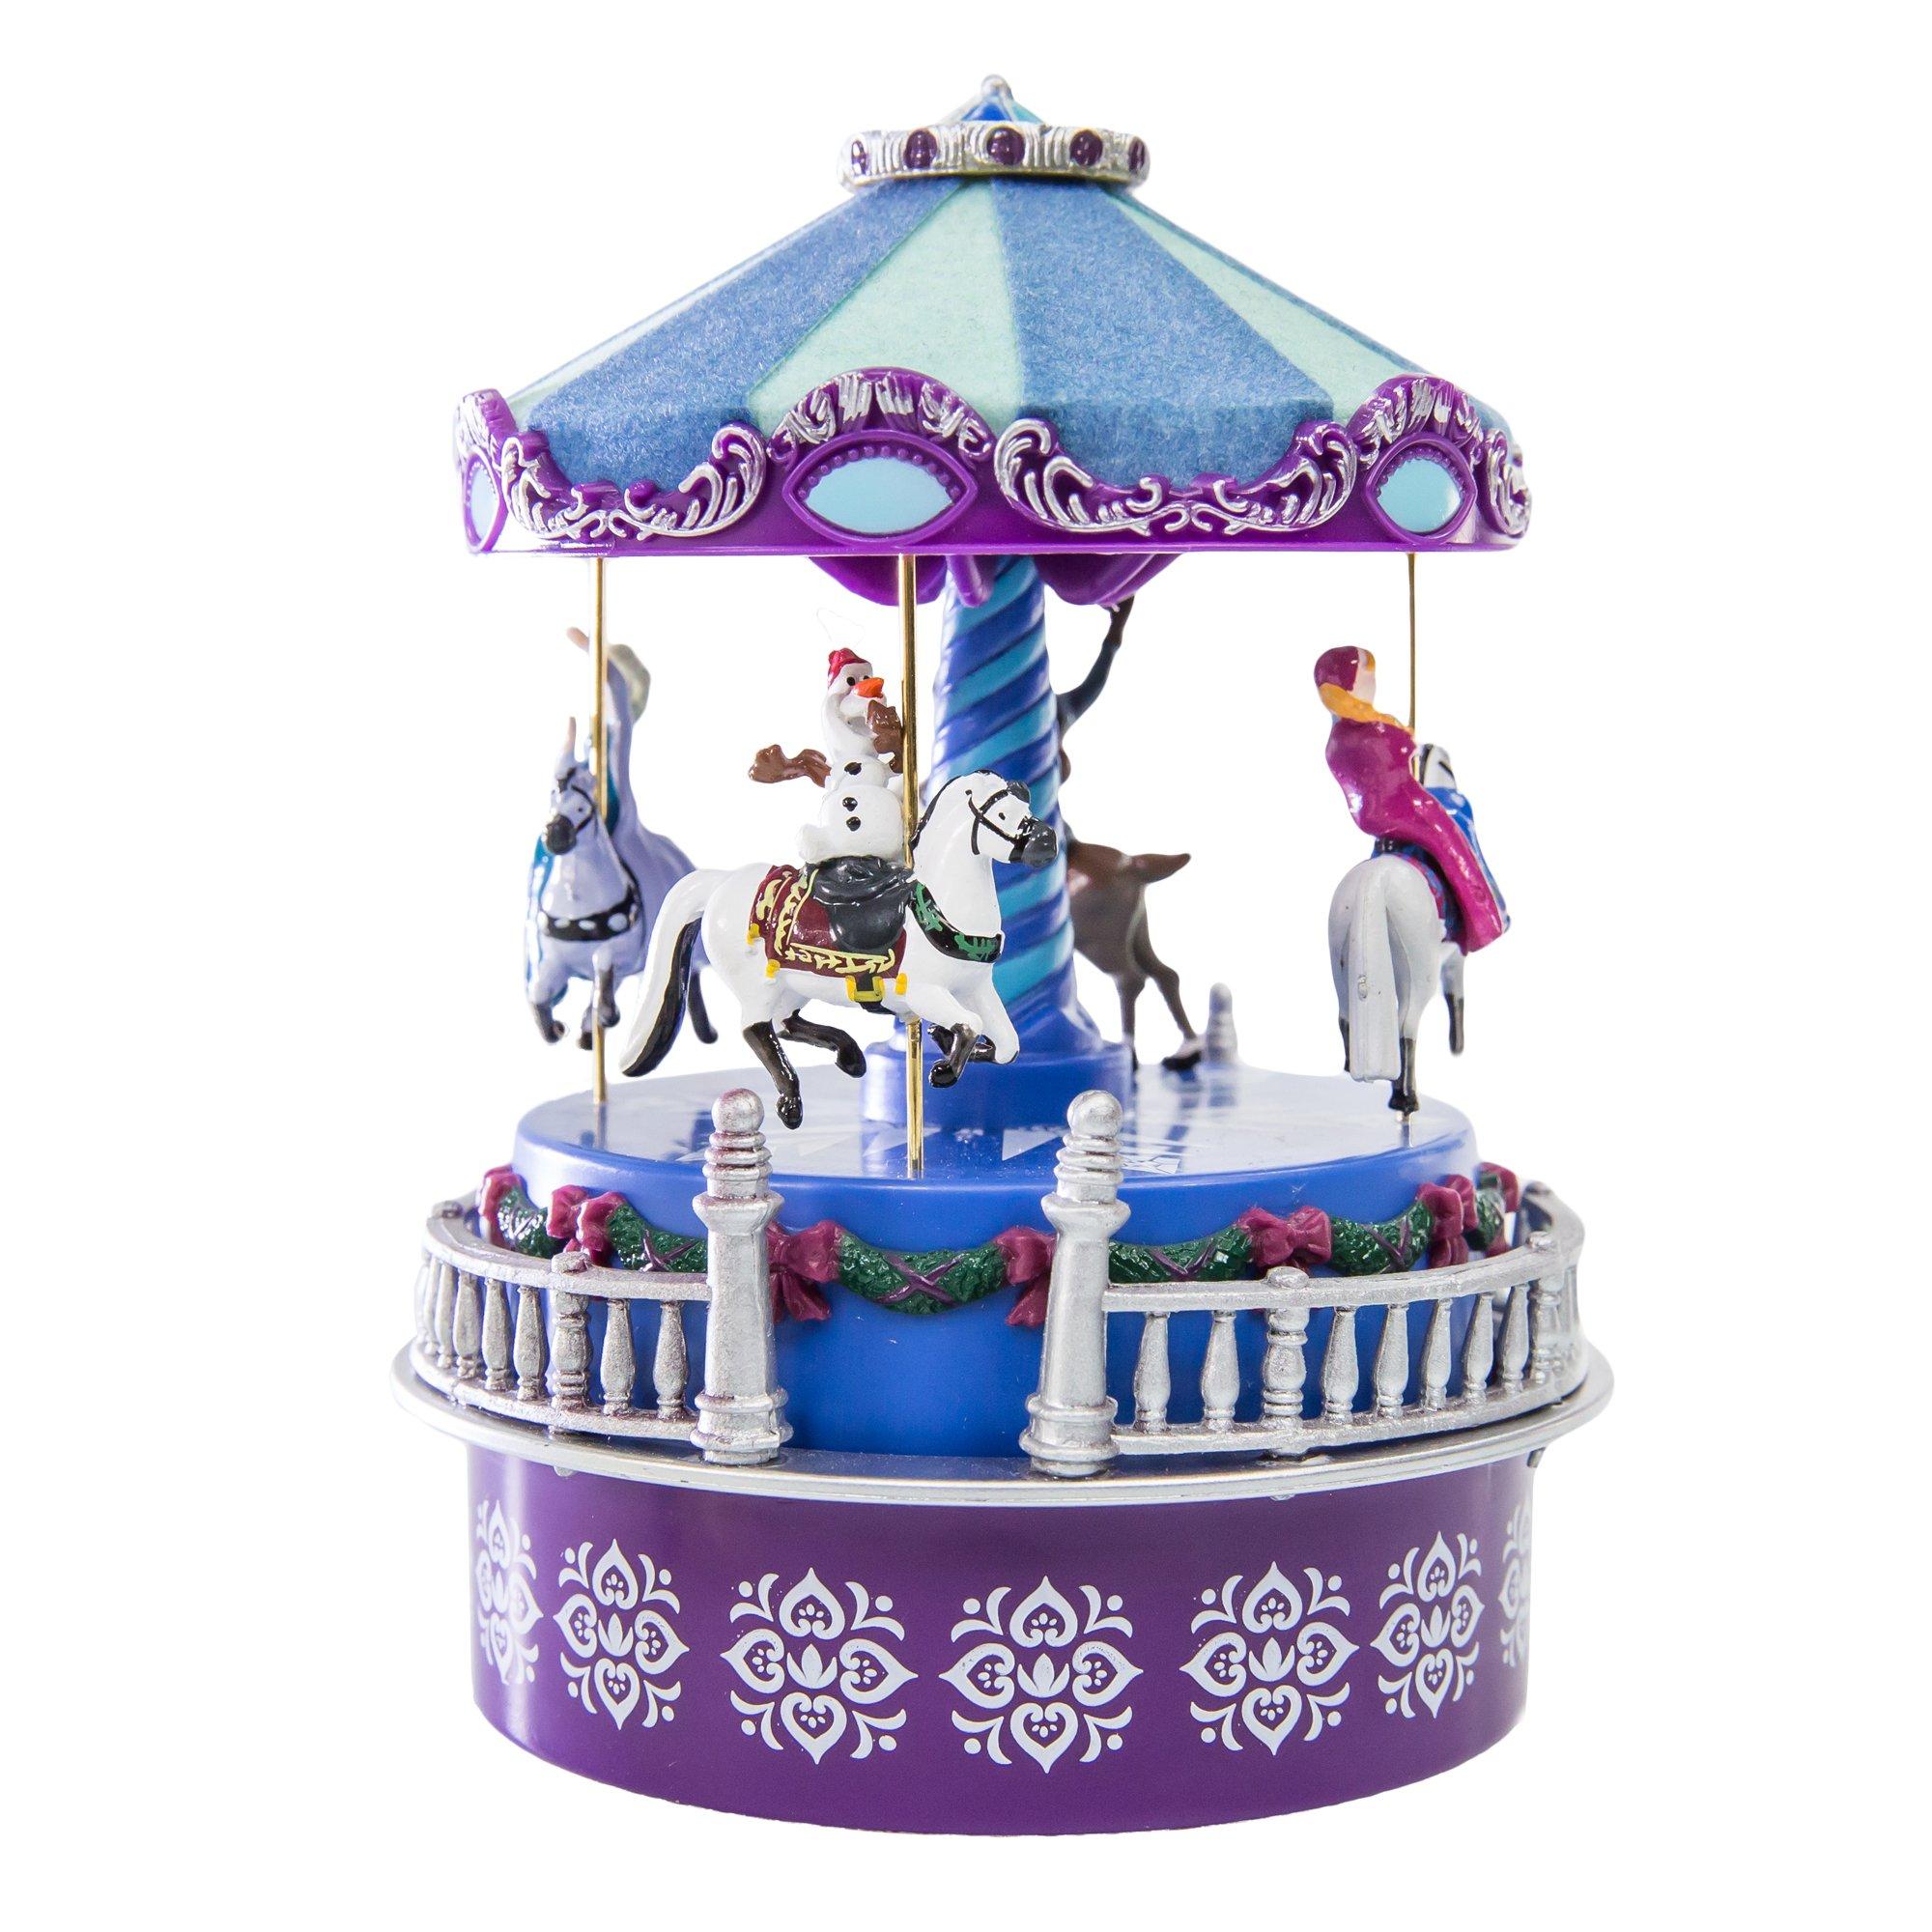 "Disney Frozen Mini Carousel - Wind-up version (4 1/2"" tall)"